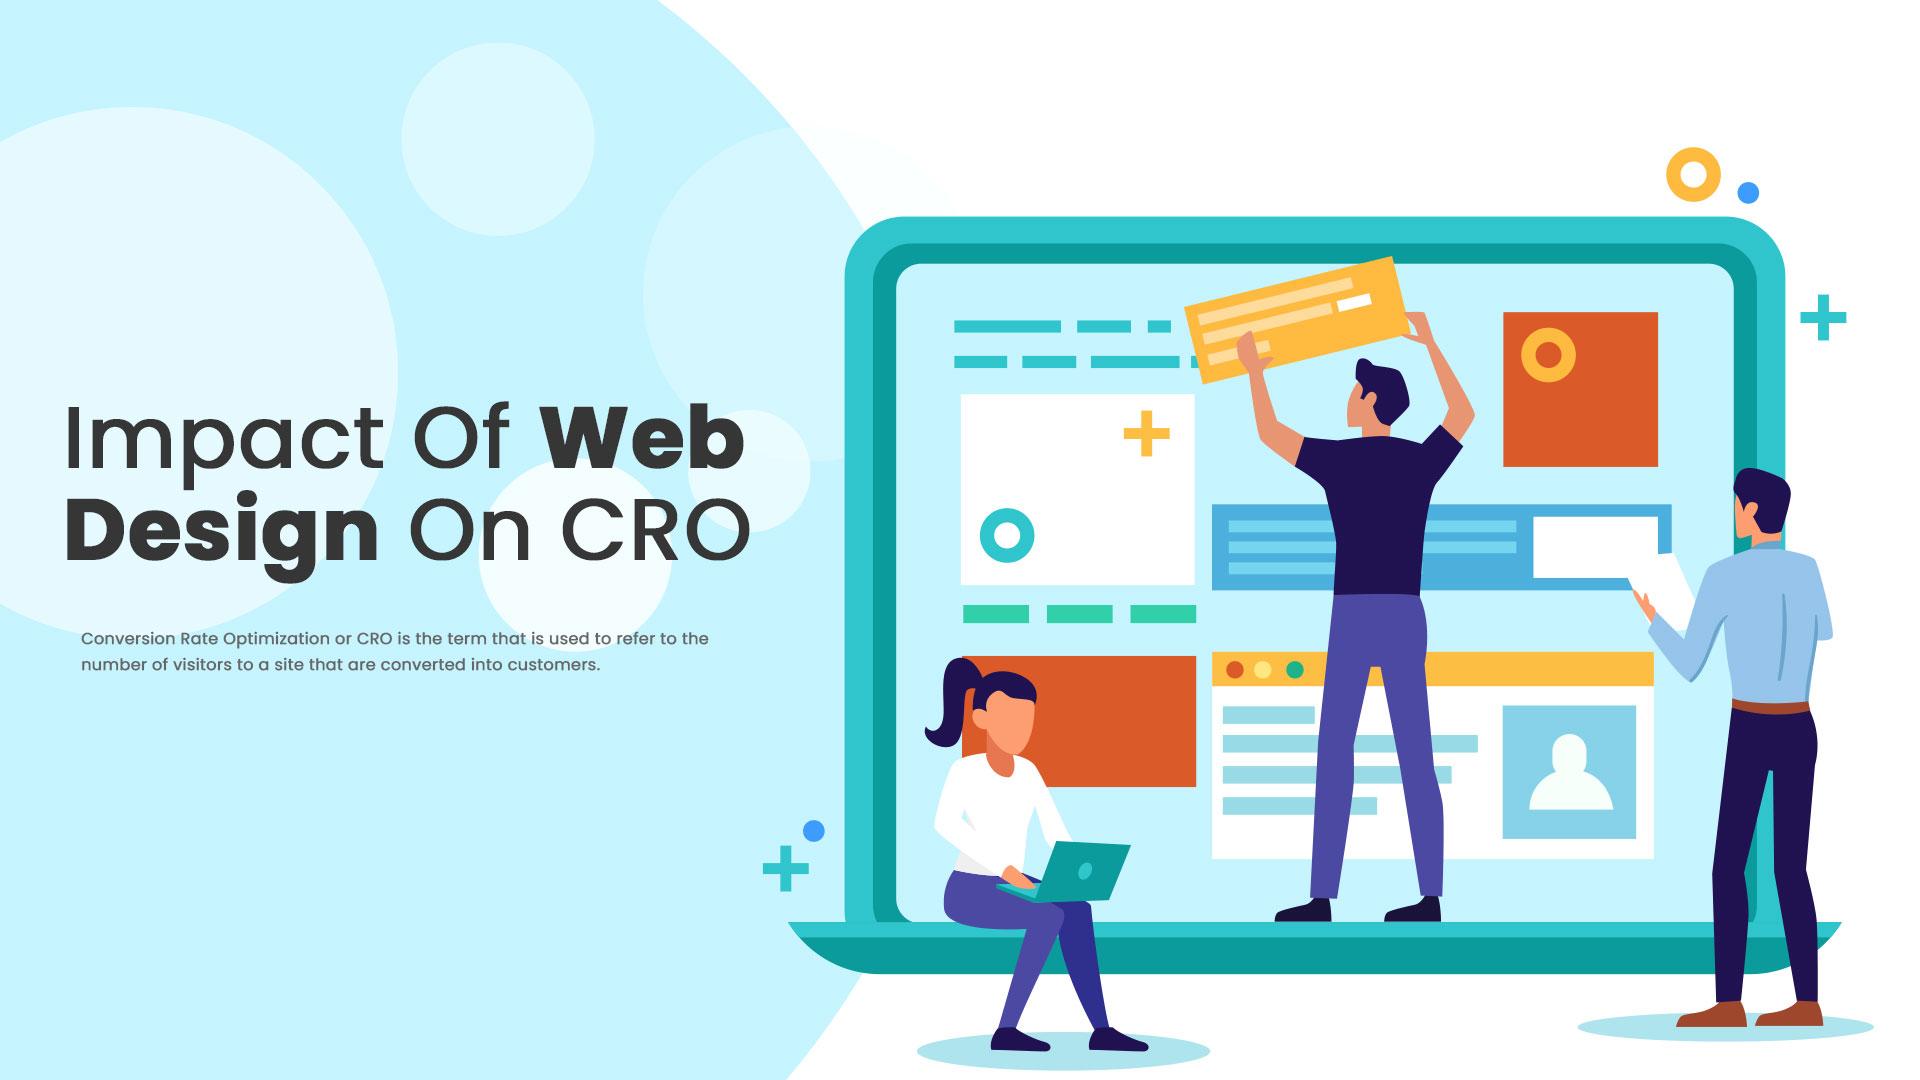 Impact Of Web Design On CRO